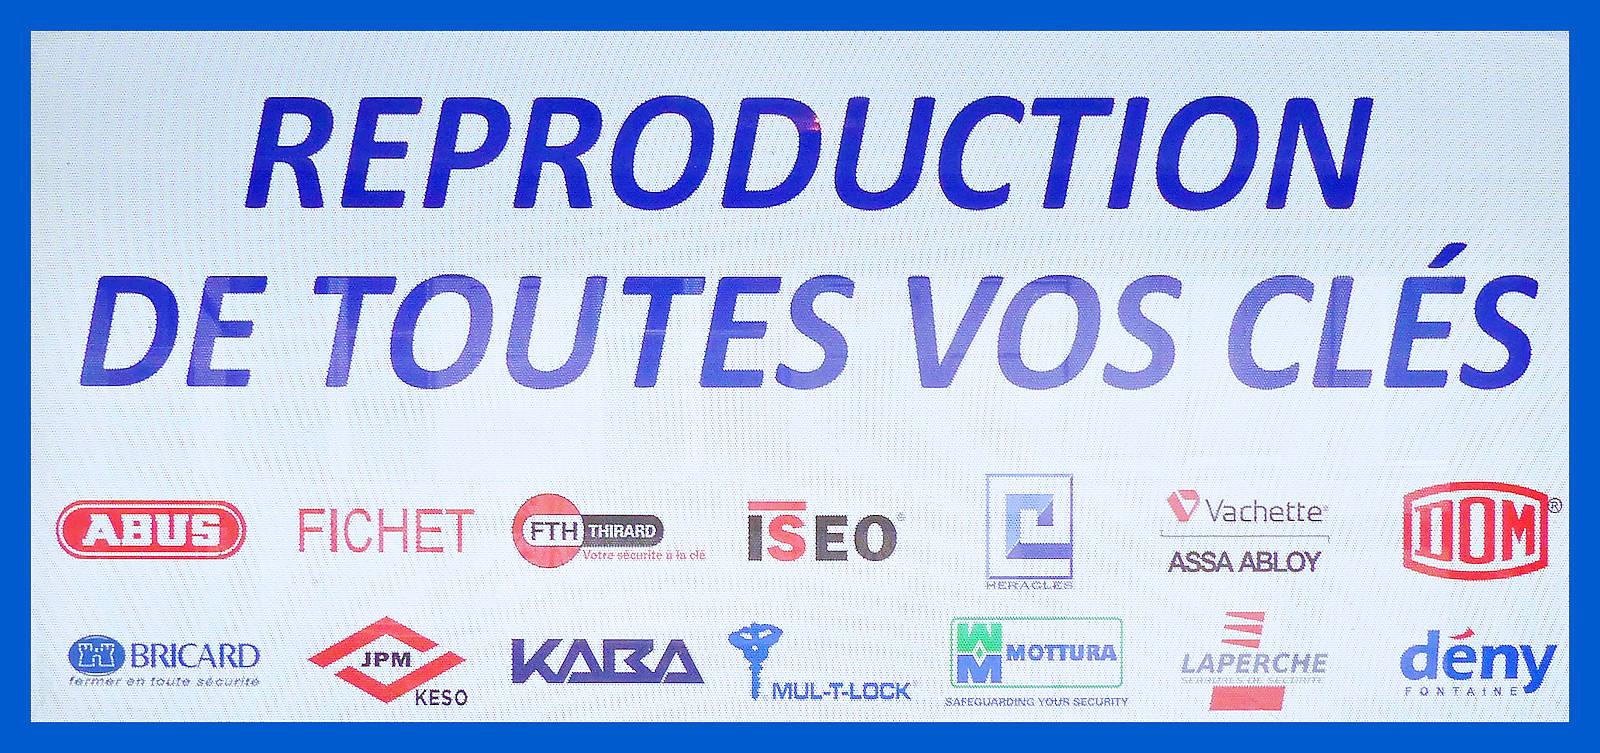 Reproduction Clés - Tourcoing